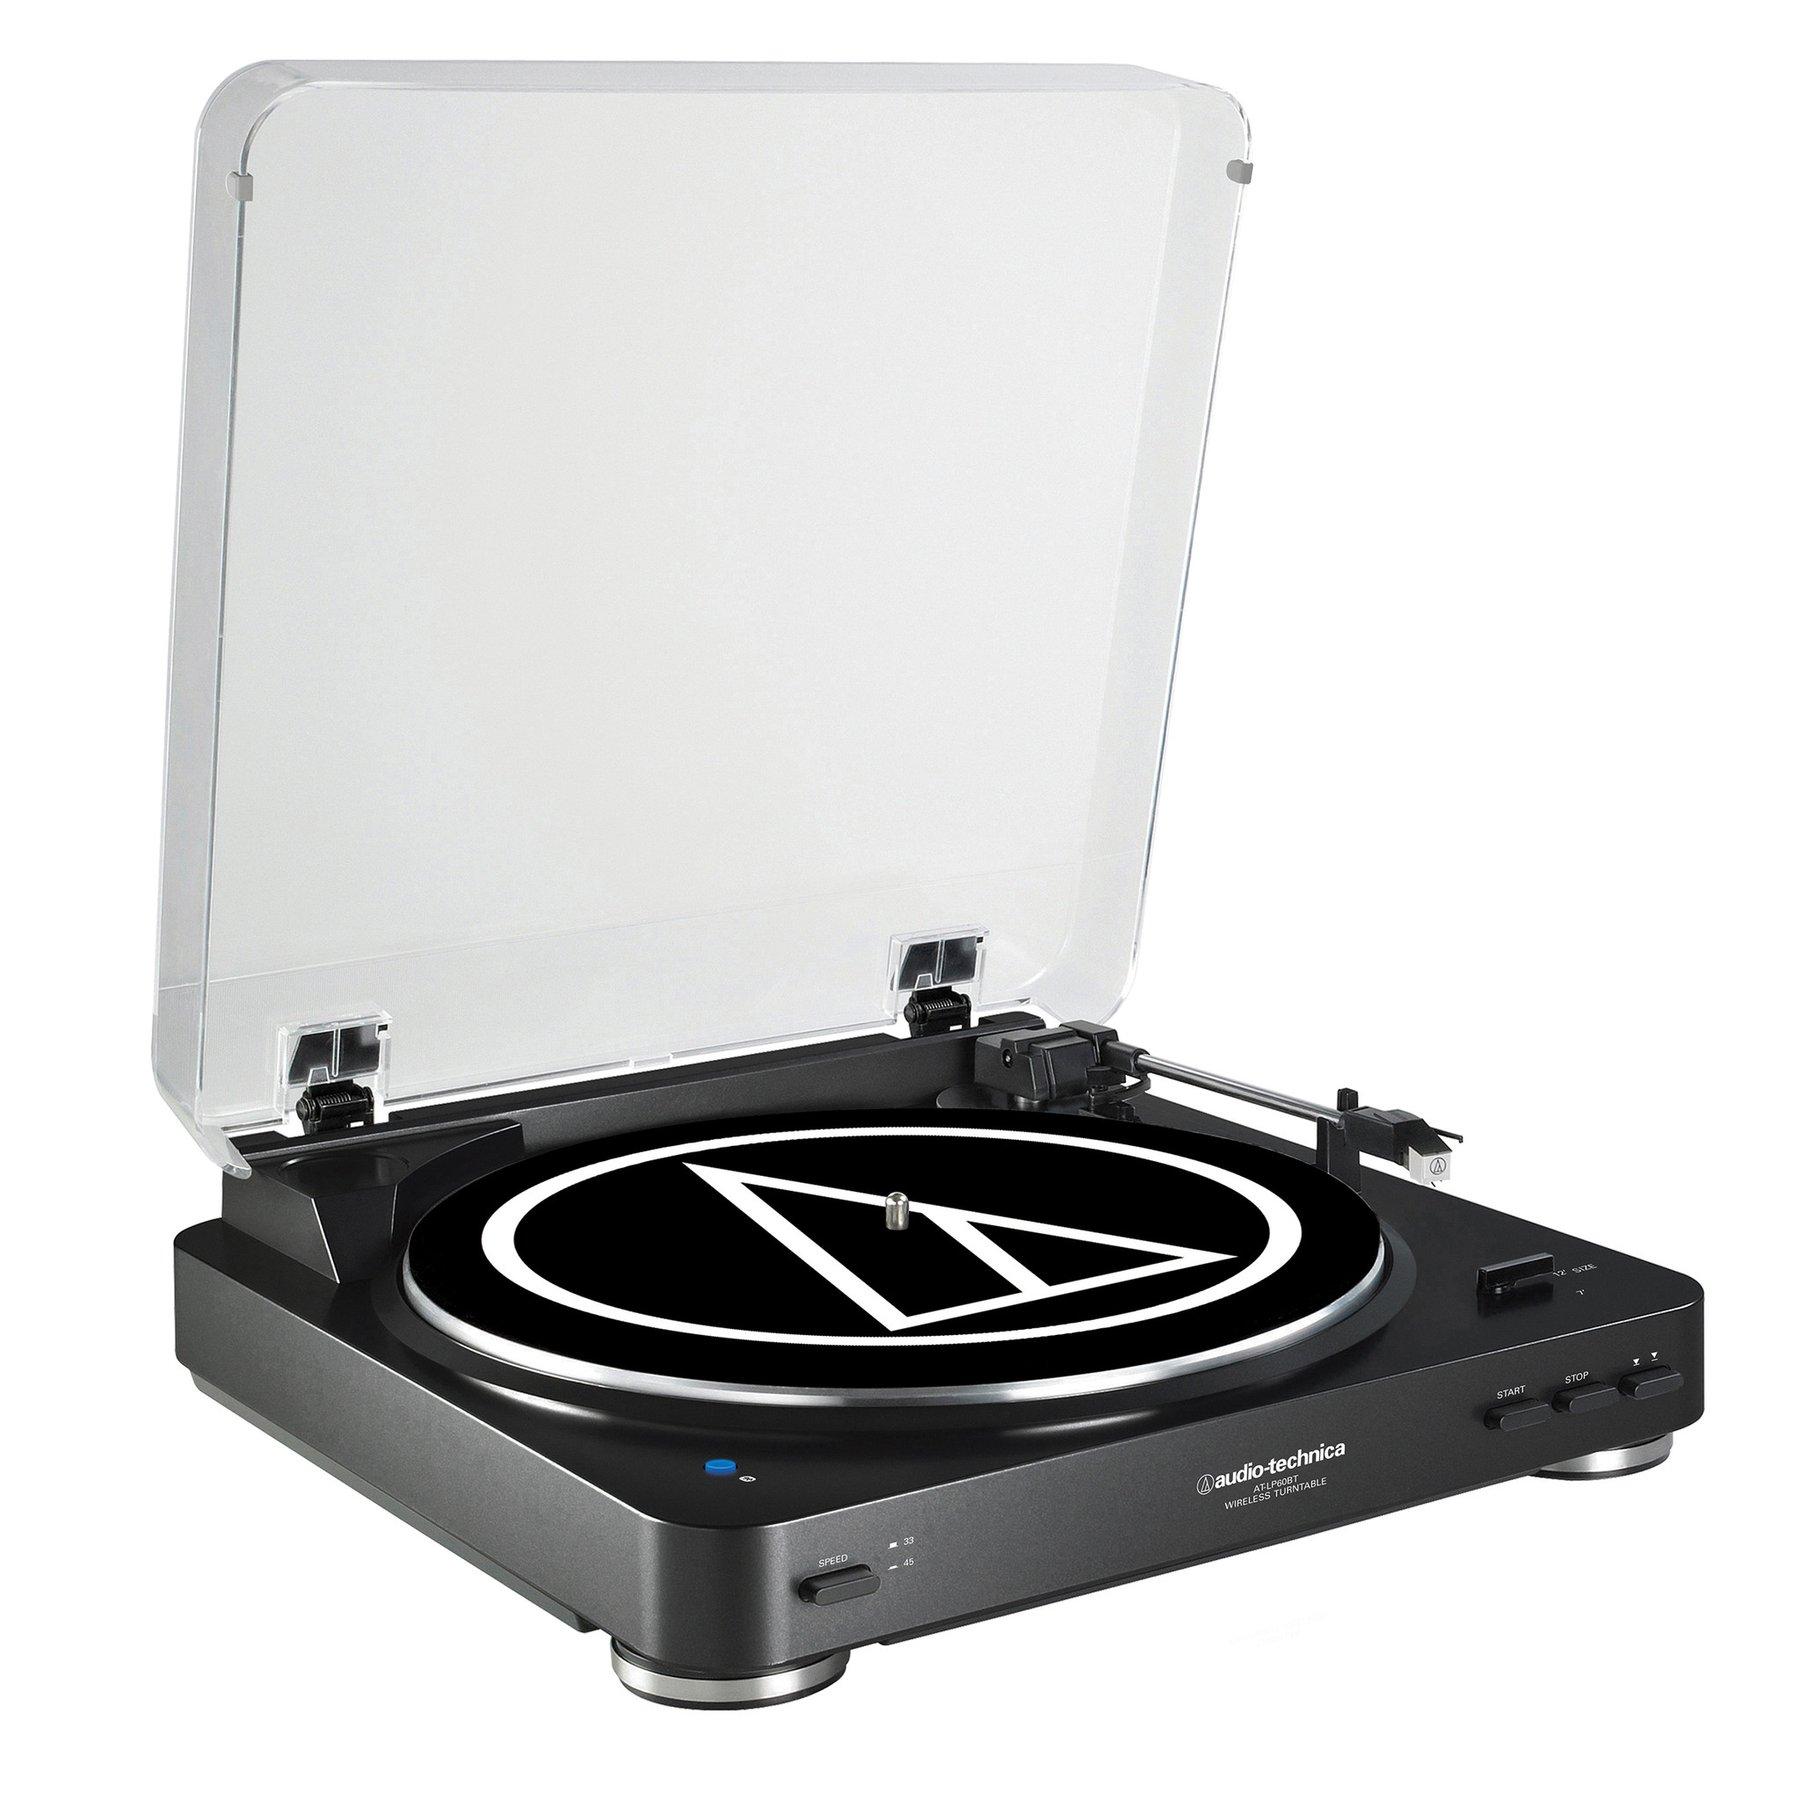 Surplustronics - Audio Technica Bluetooth Turntable